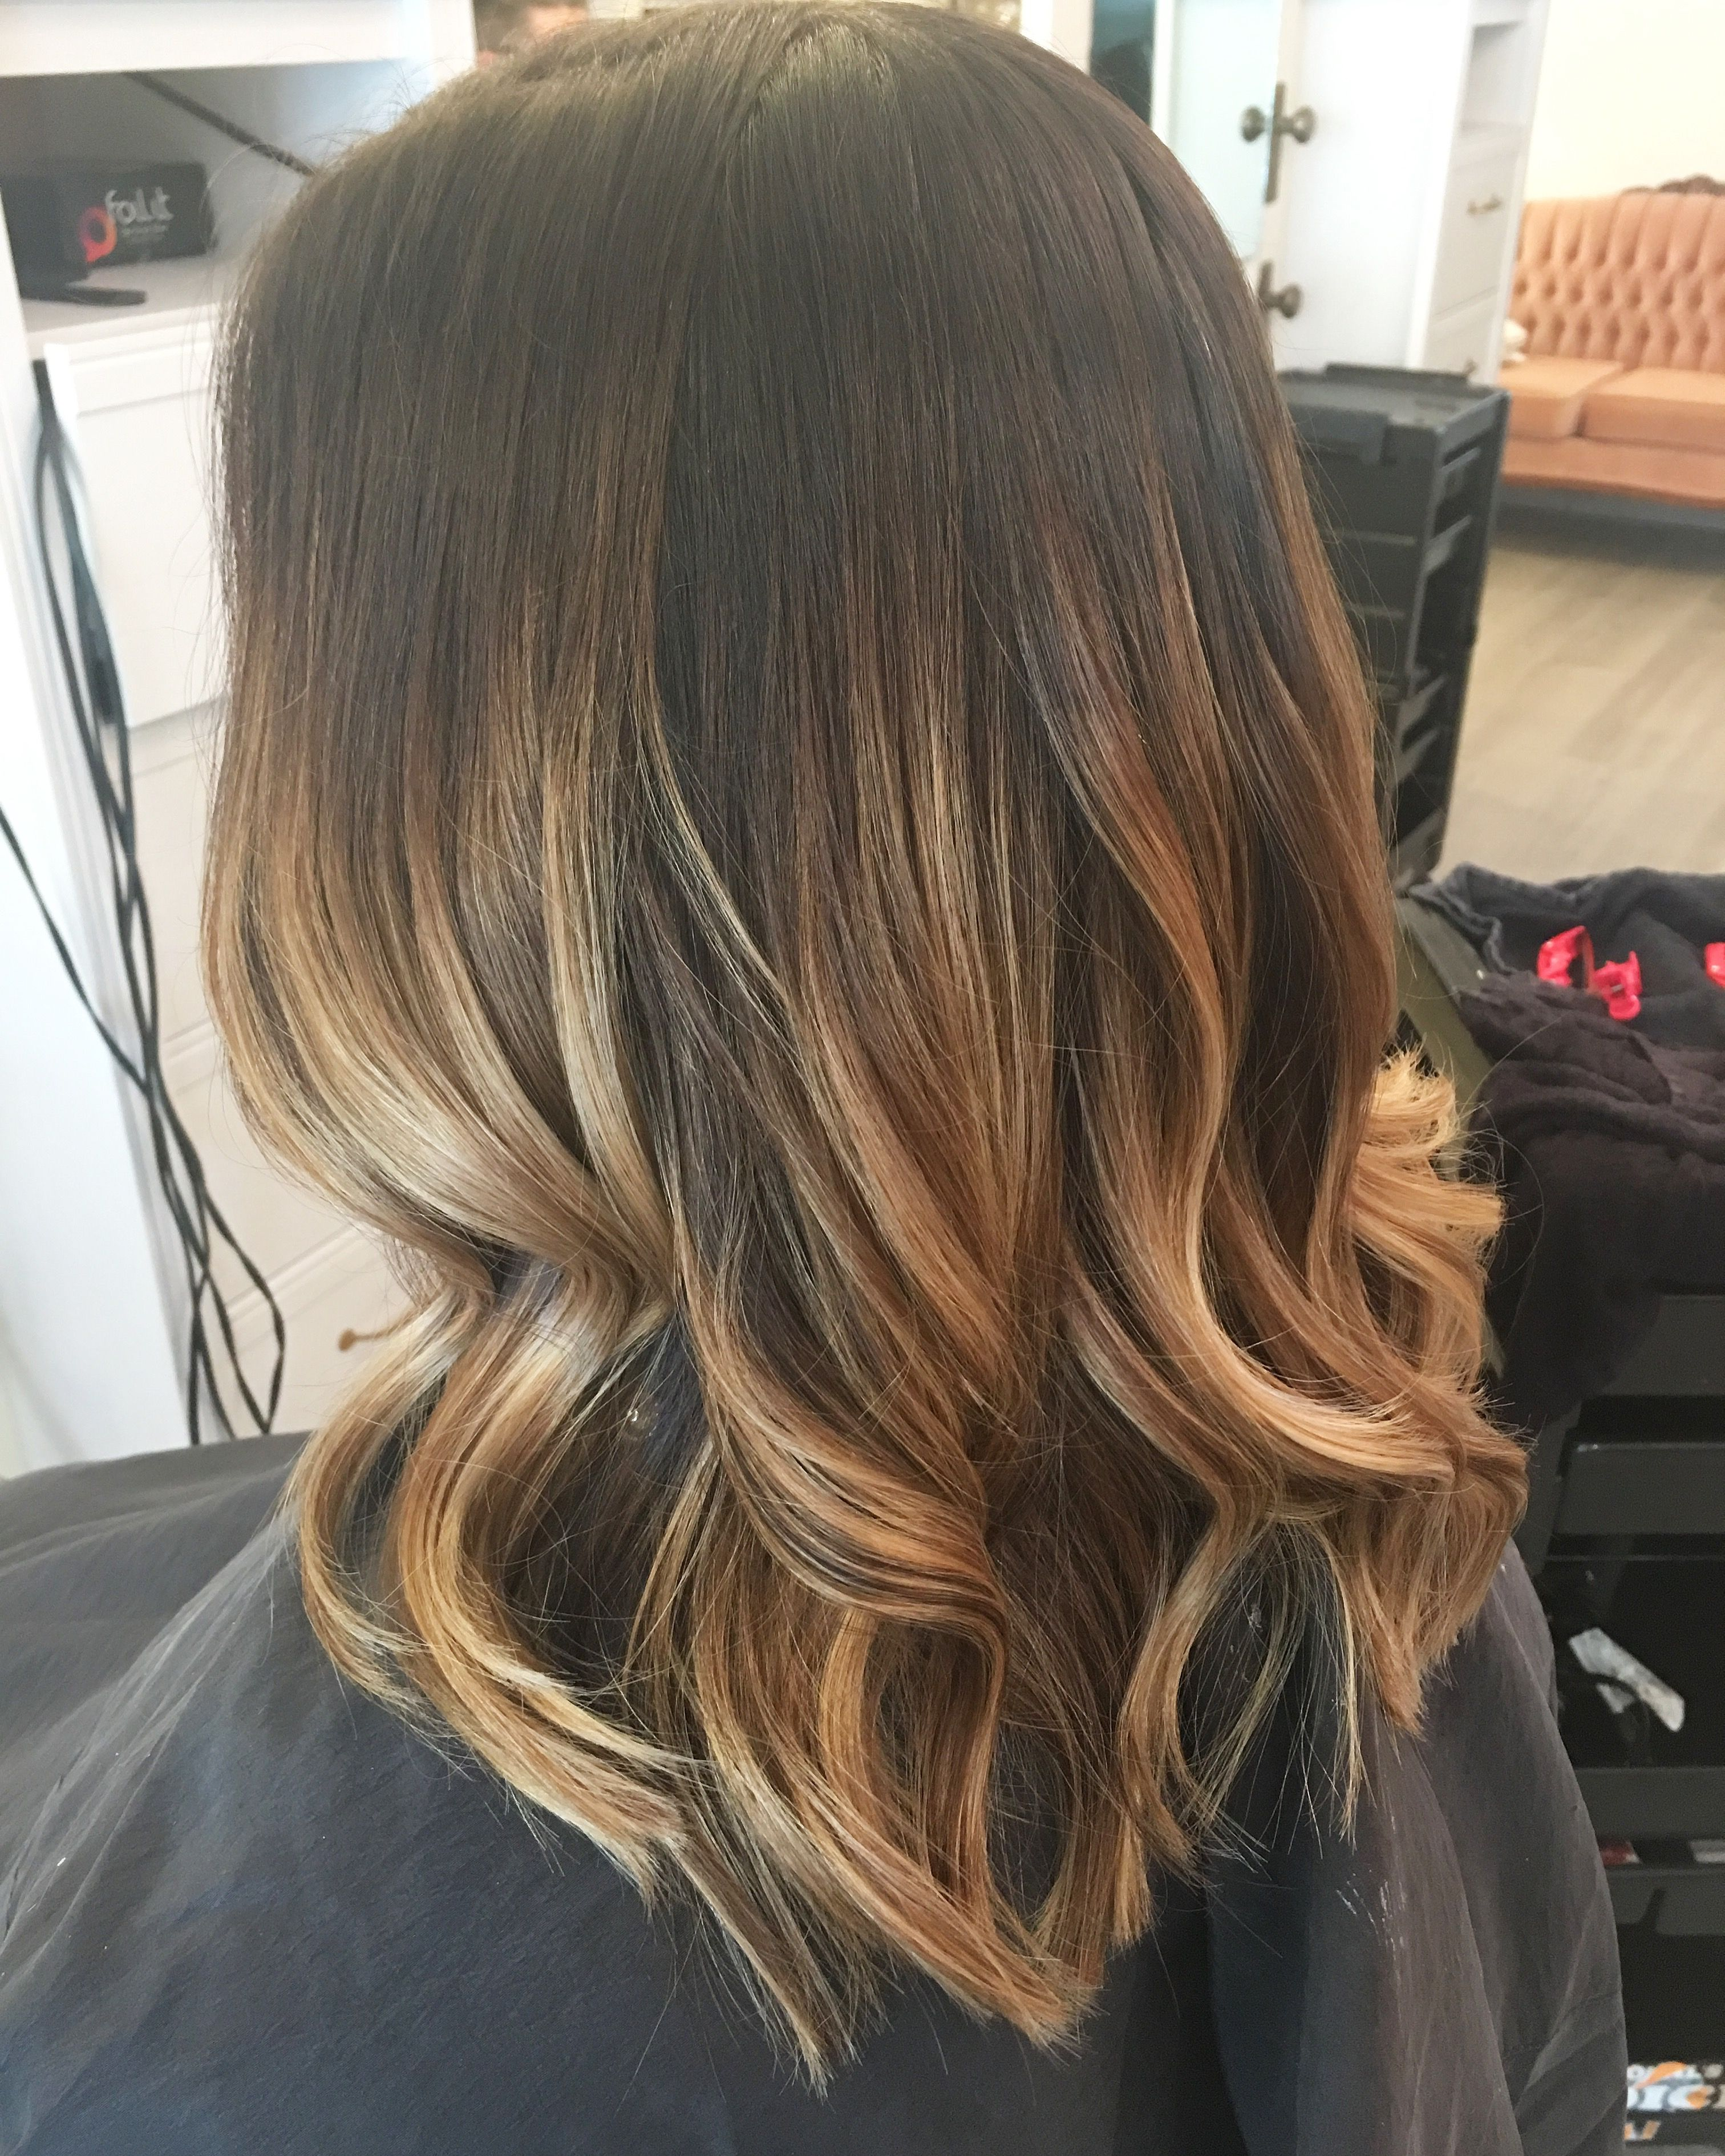 Blonde balayage caramel warm tones dark roots brunette curls lob short haircut summer haircut - Balayage blond caramel ...